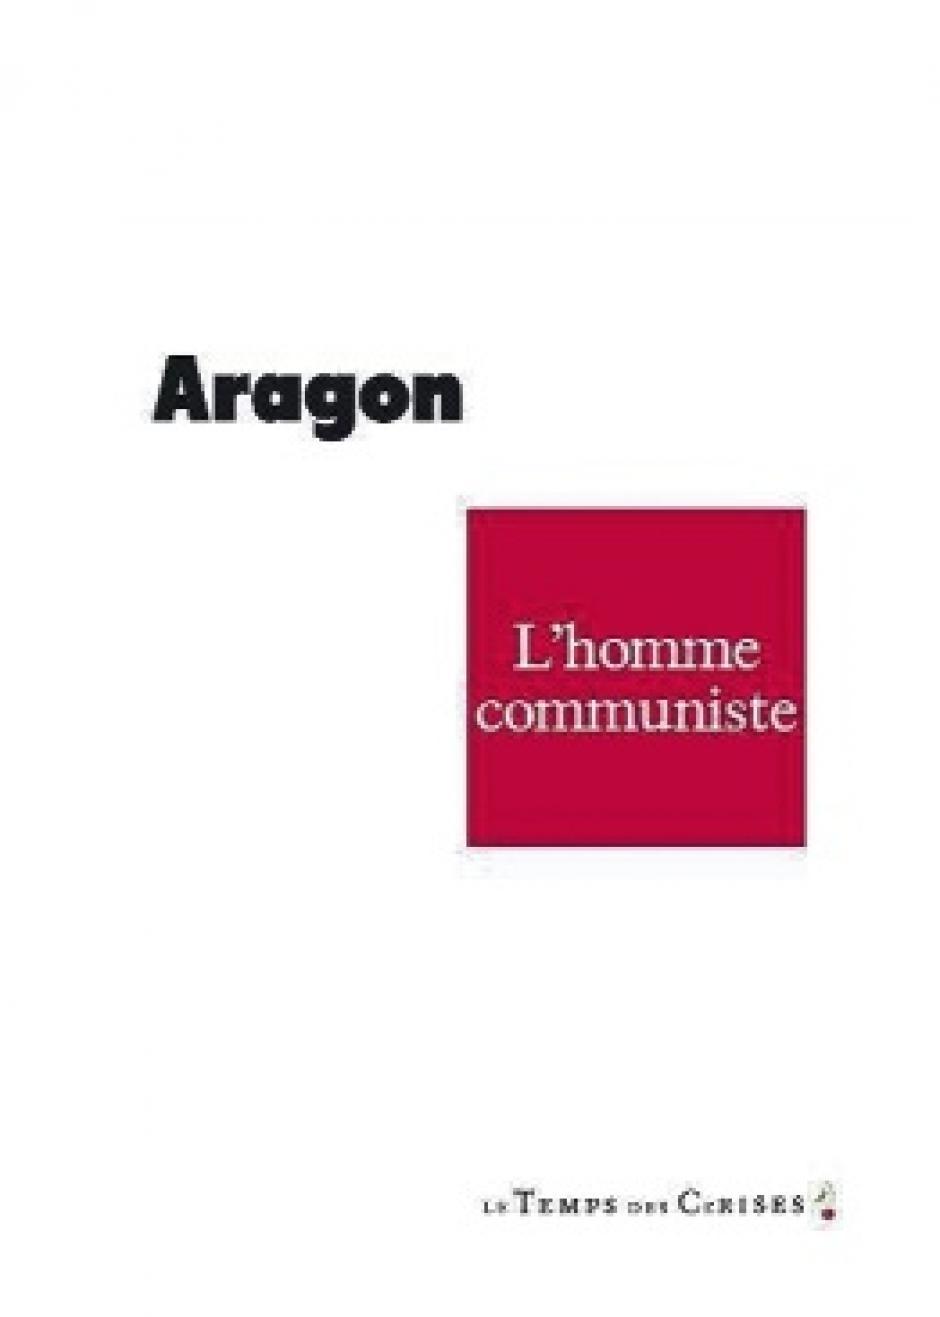 Aragon, L'homme communiste